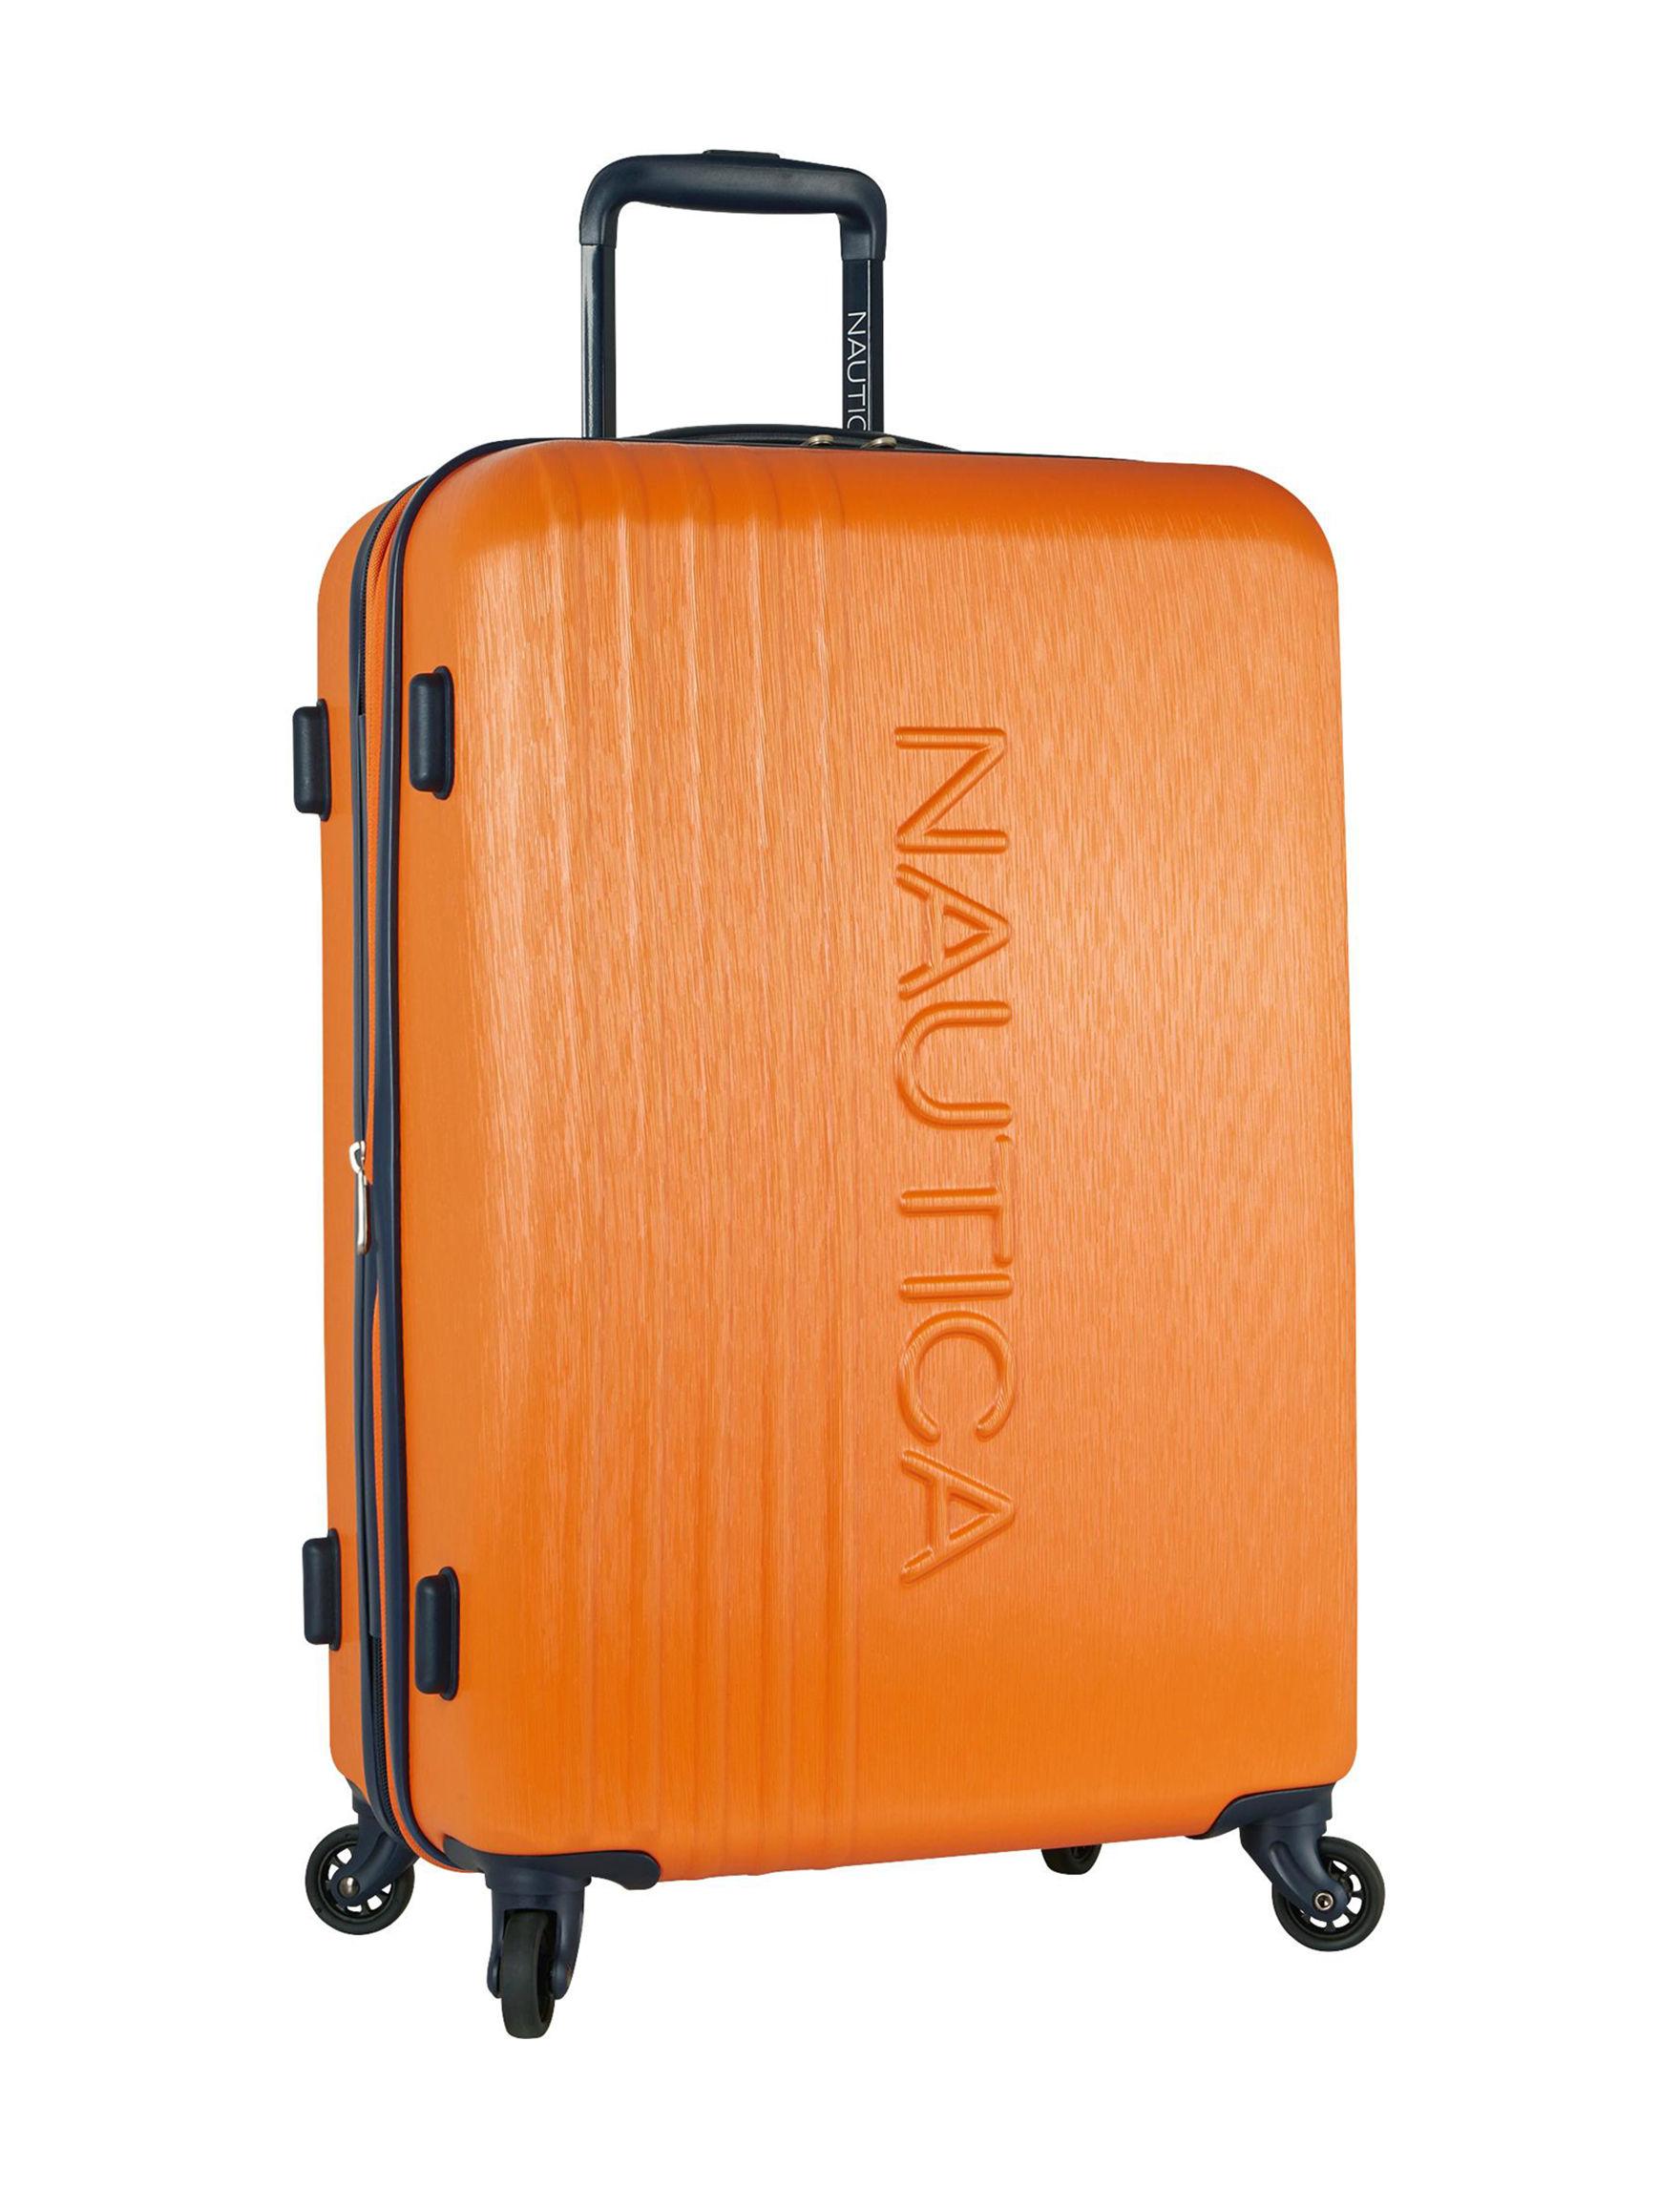 Nautica Orange Upright Spinners